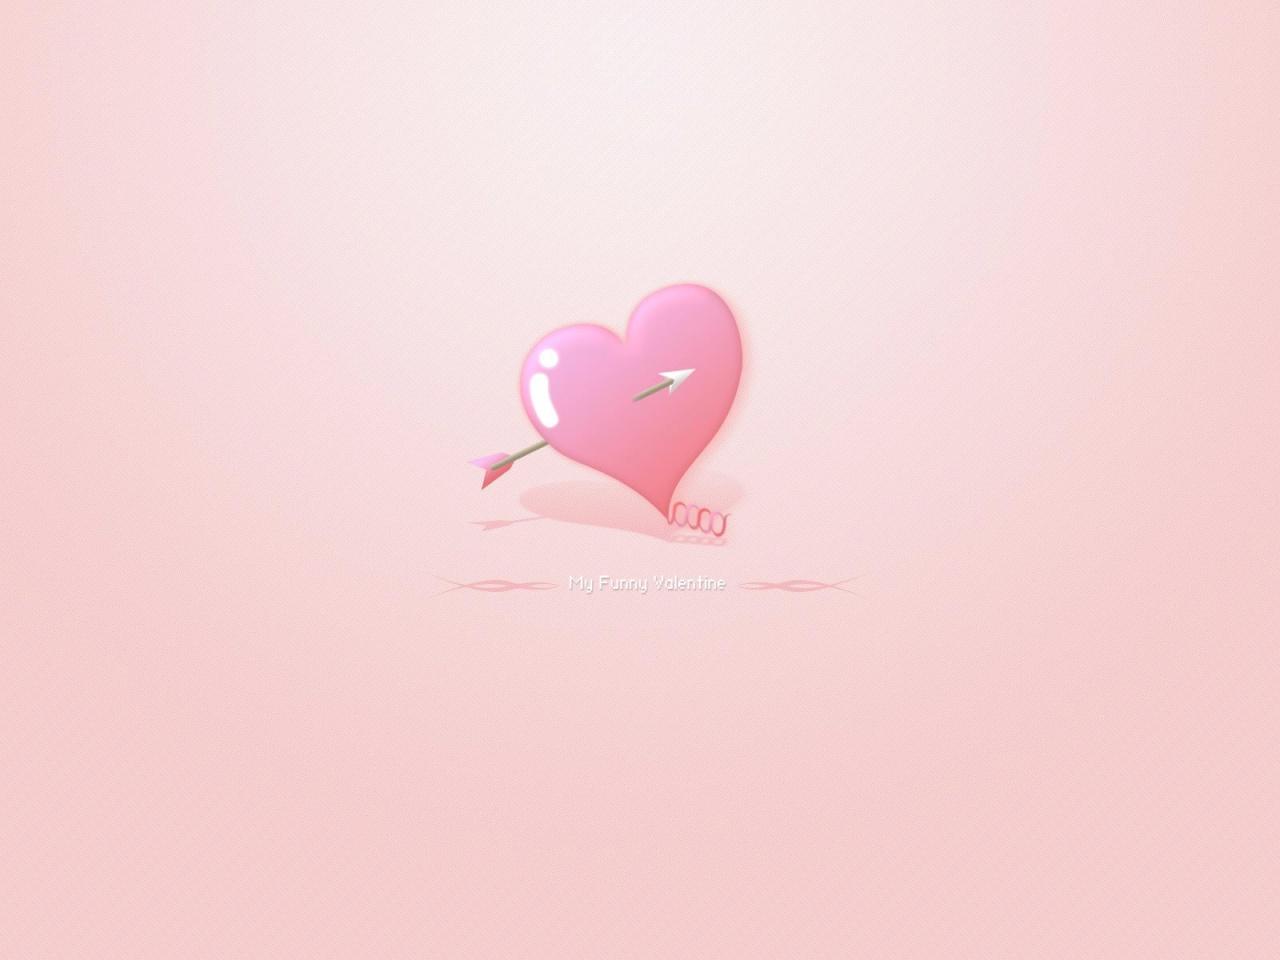 Funny valentine desktop wallpaper 1280x960